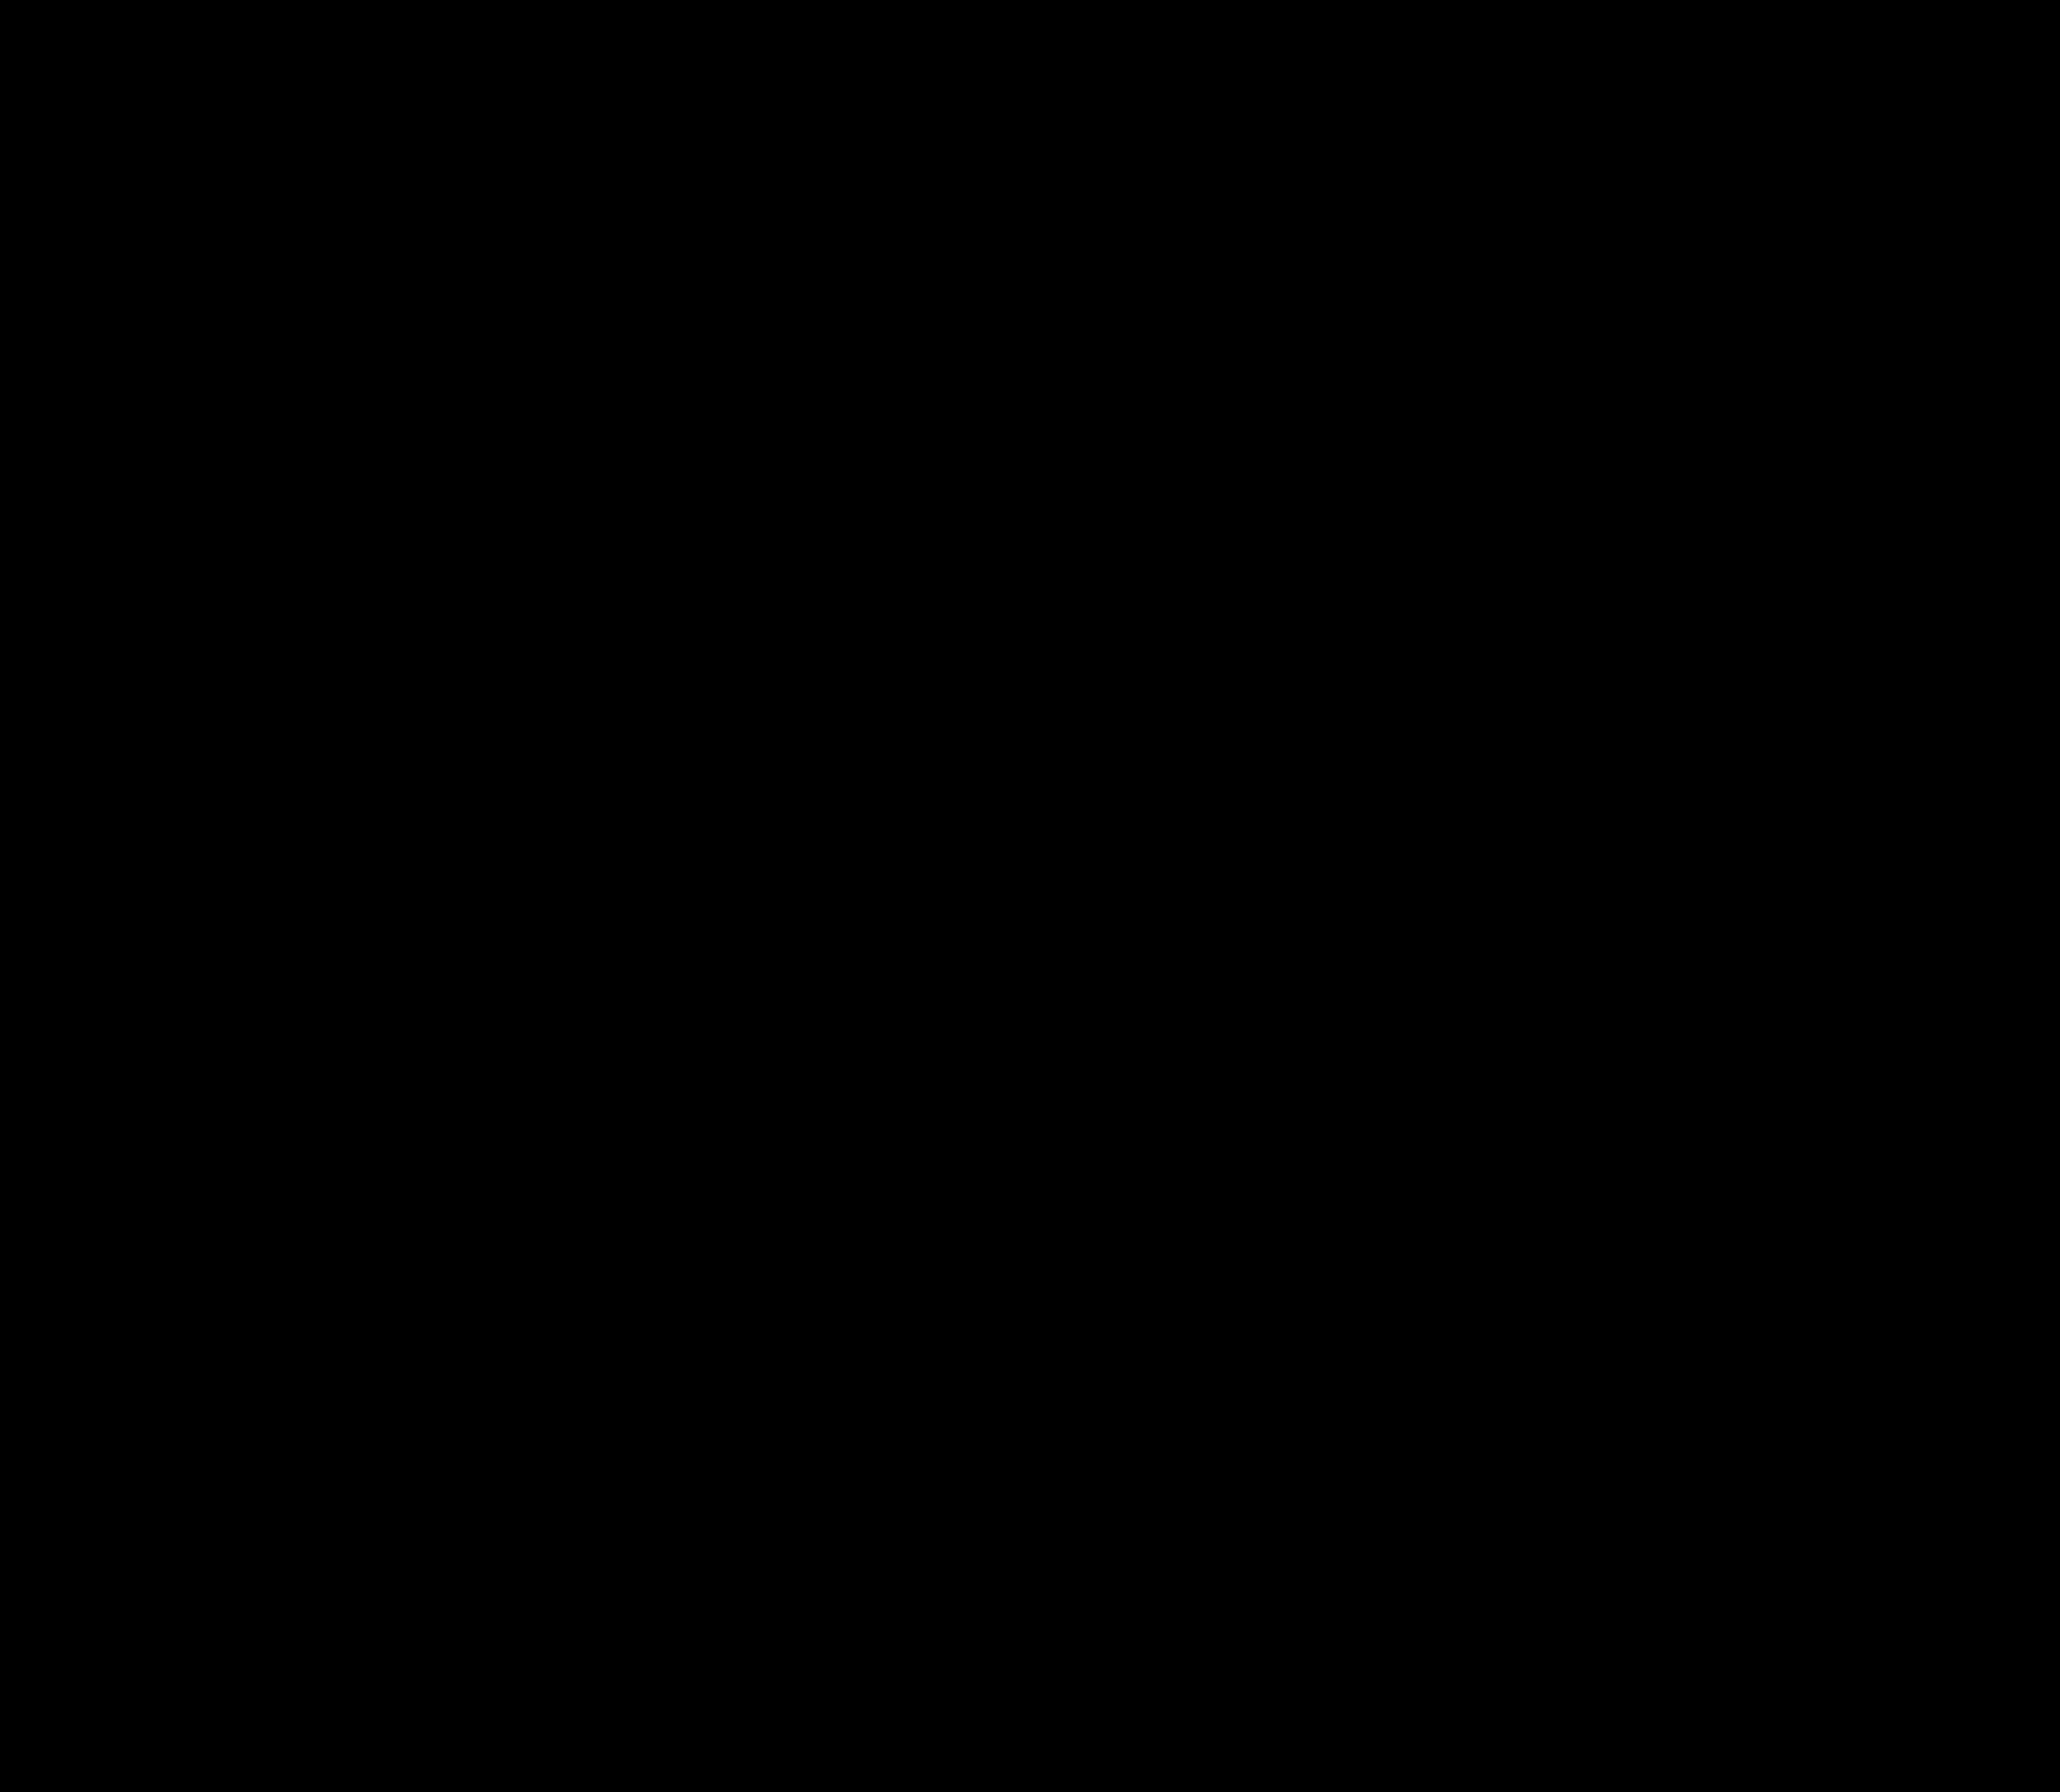 2282x1985 Clip Art Wifi Clip Art